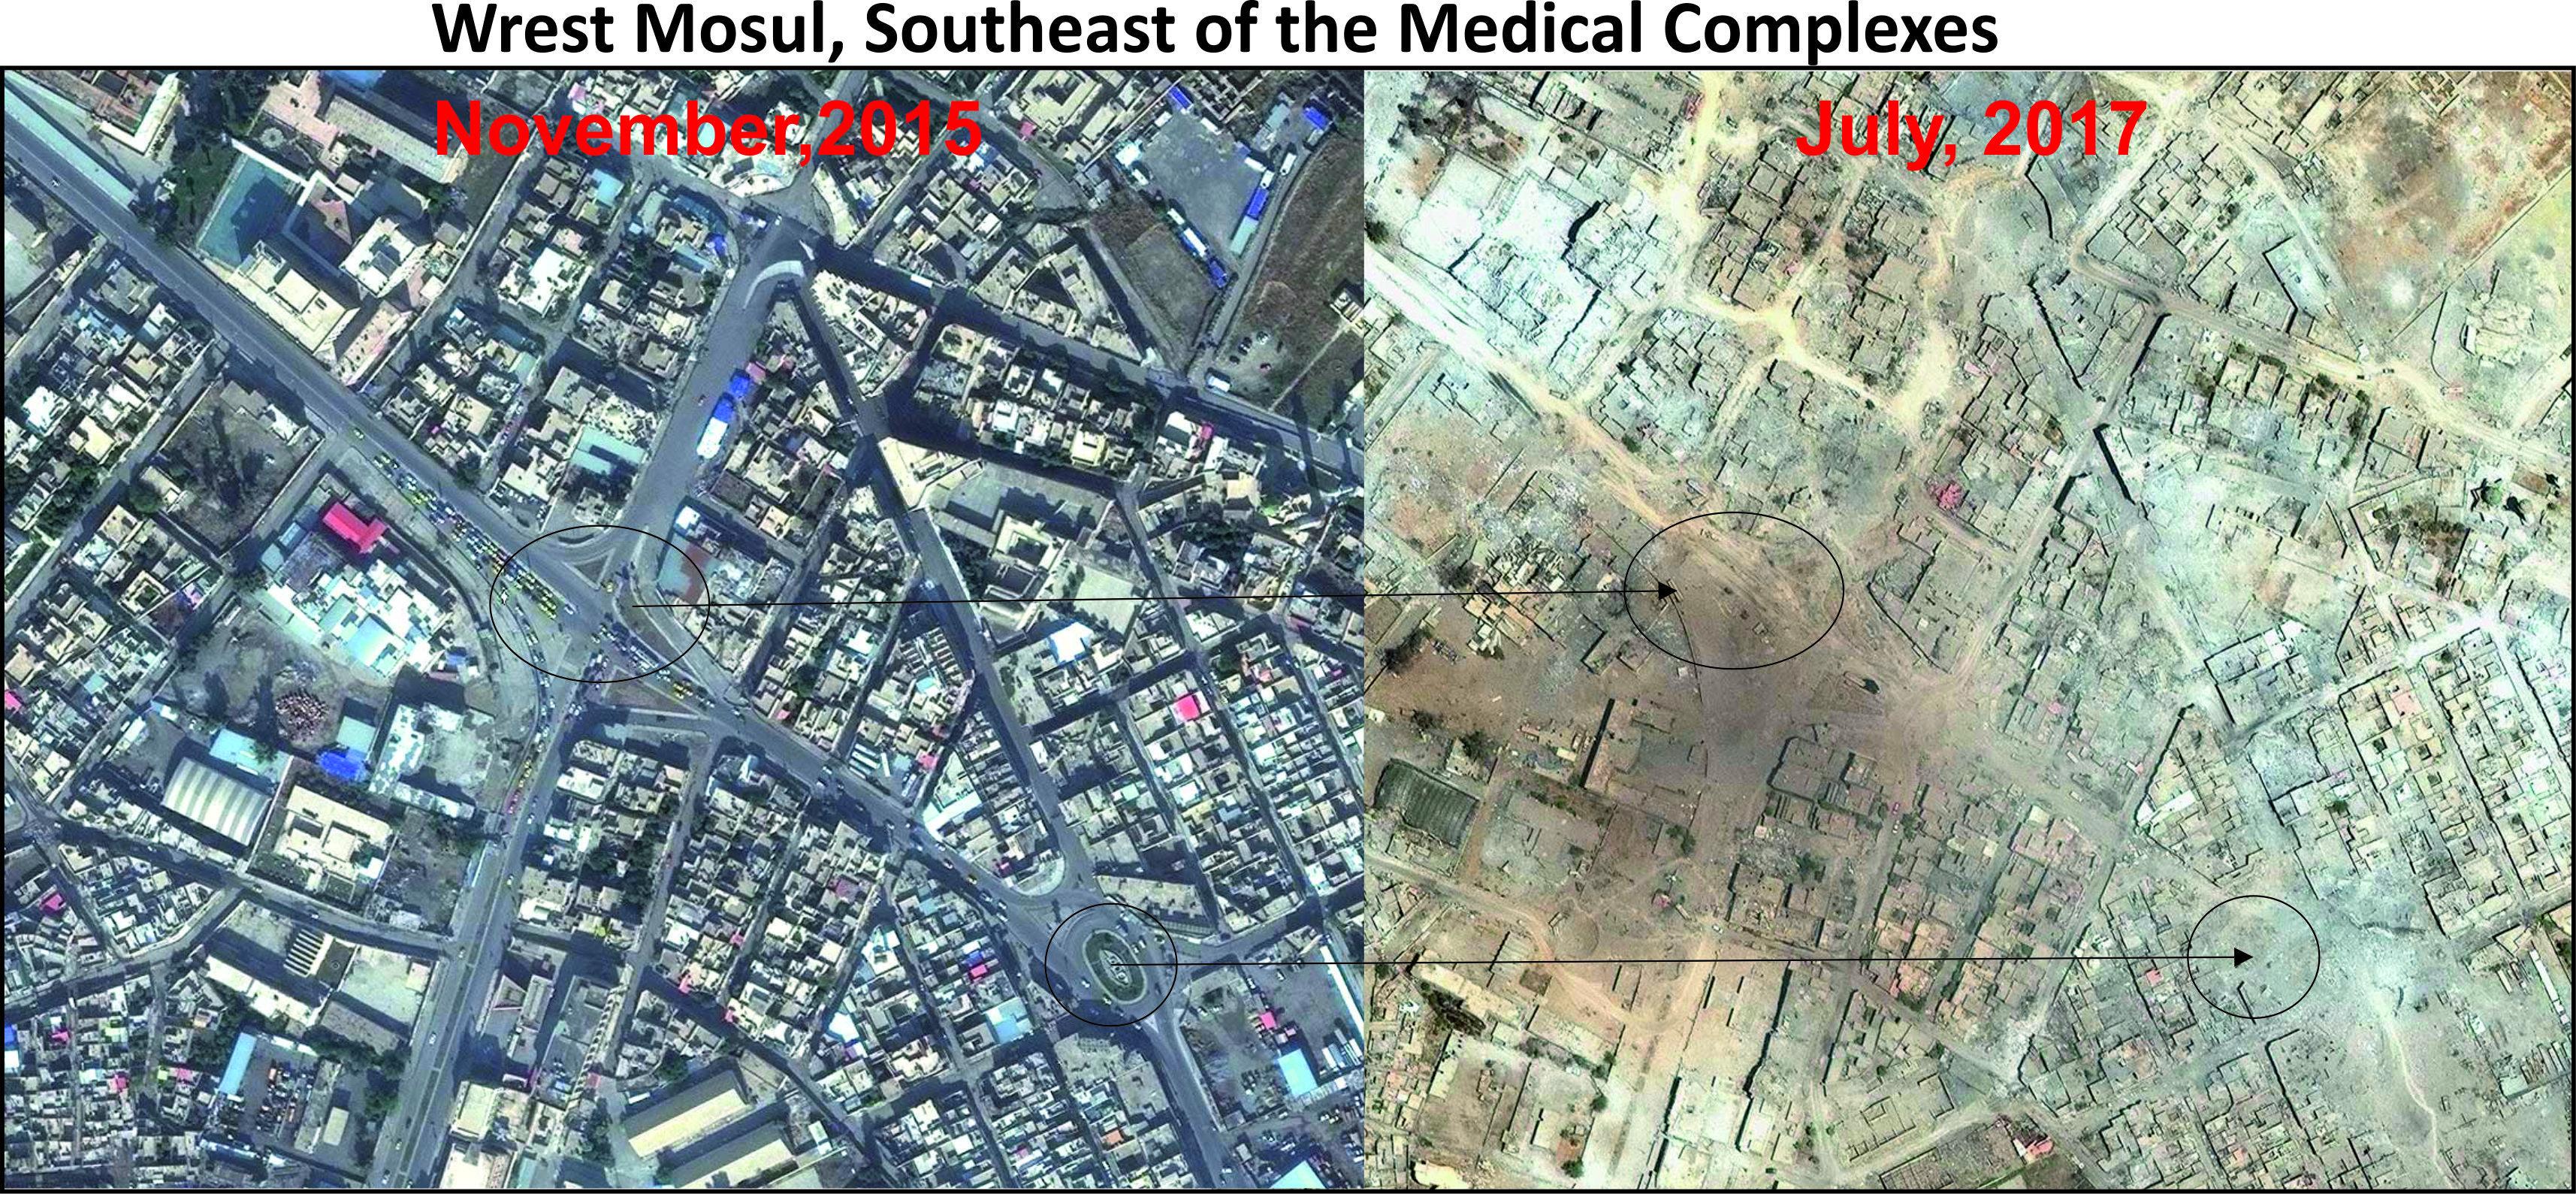 Satellite imagery of DigitalGlobe shows the destruction